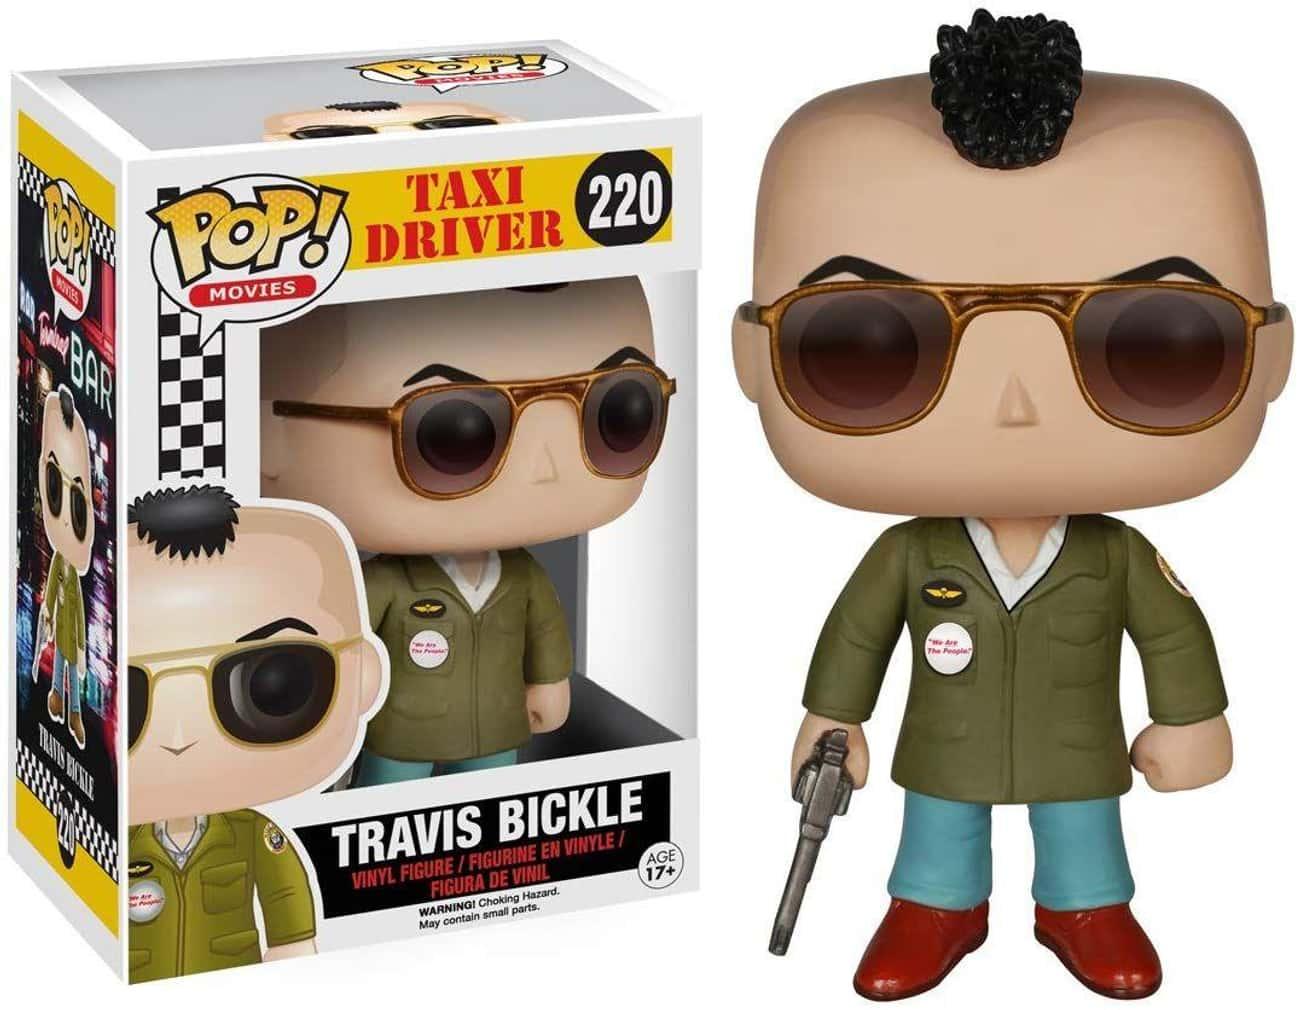 Travis Bickle ('Taxi Driver')